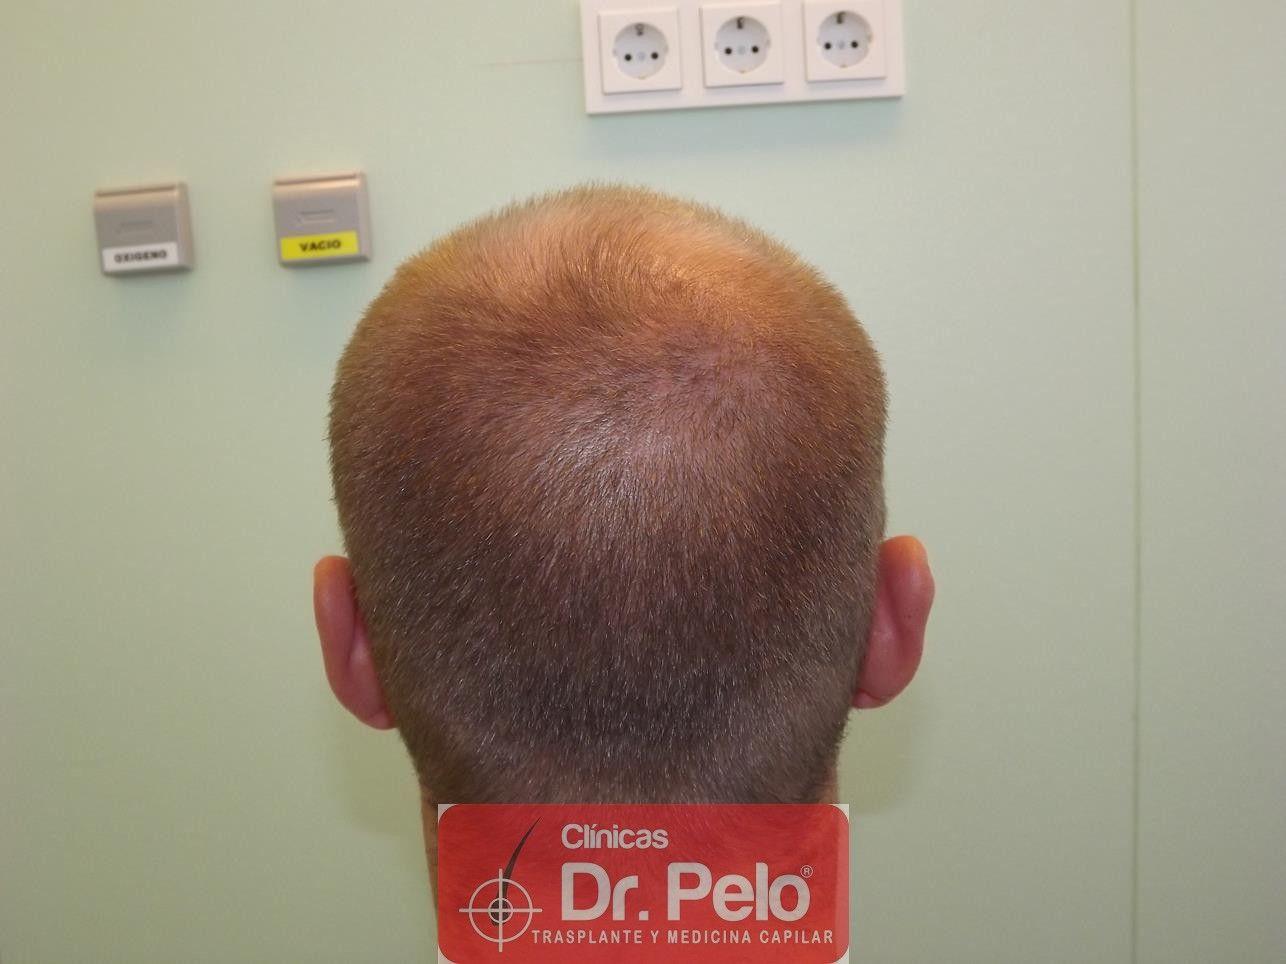 [Imagen: trasplante-pelo-fueDSCF8124-Copy.jpg]